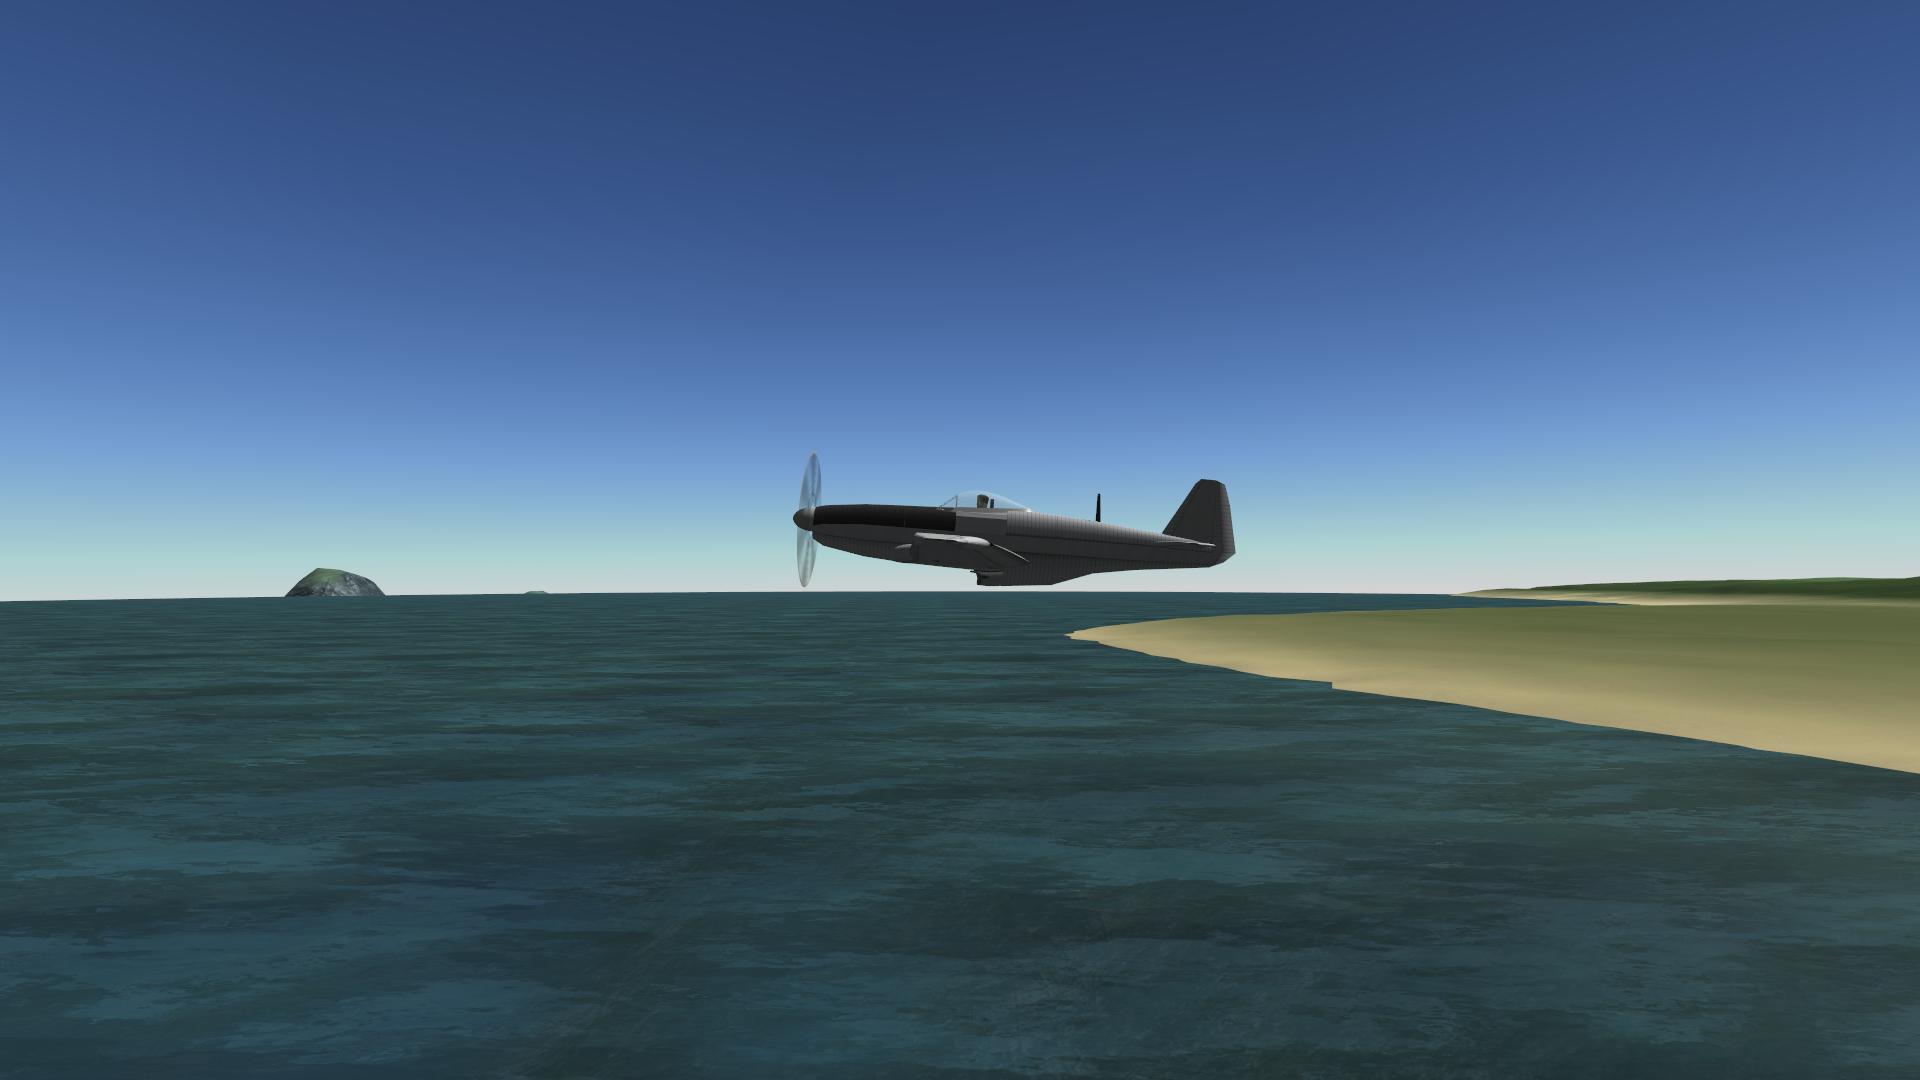 Screenshot1 by LythroA